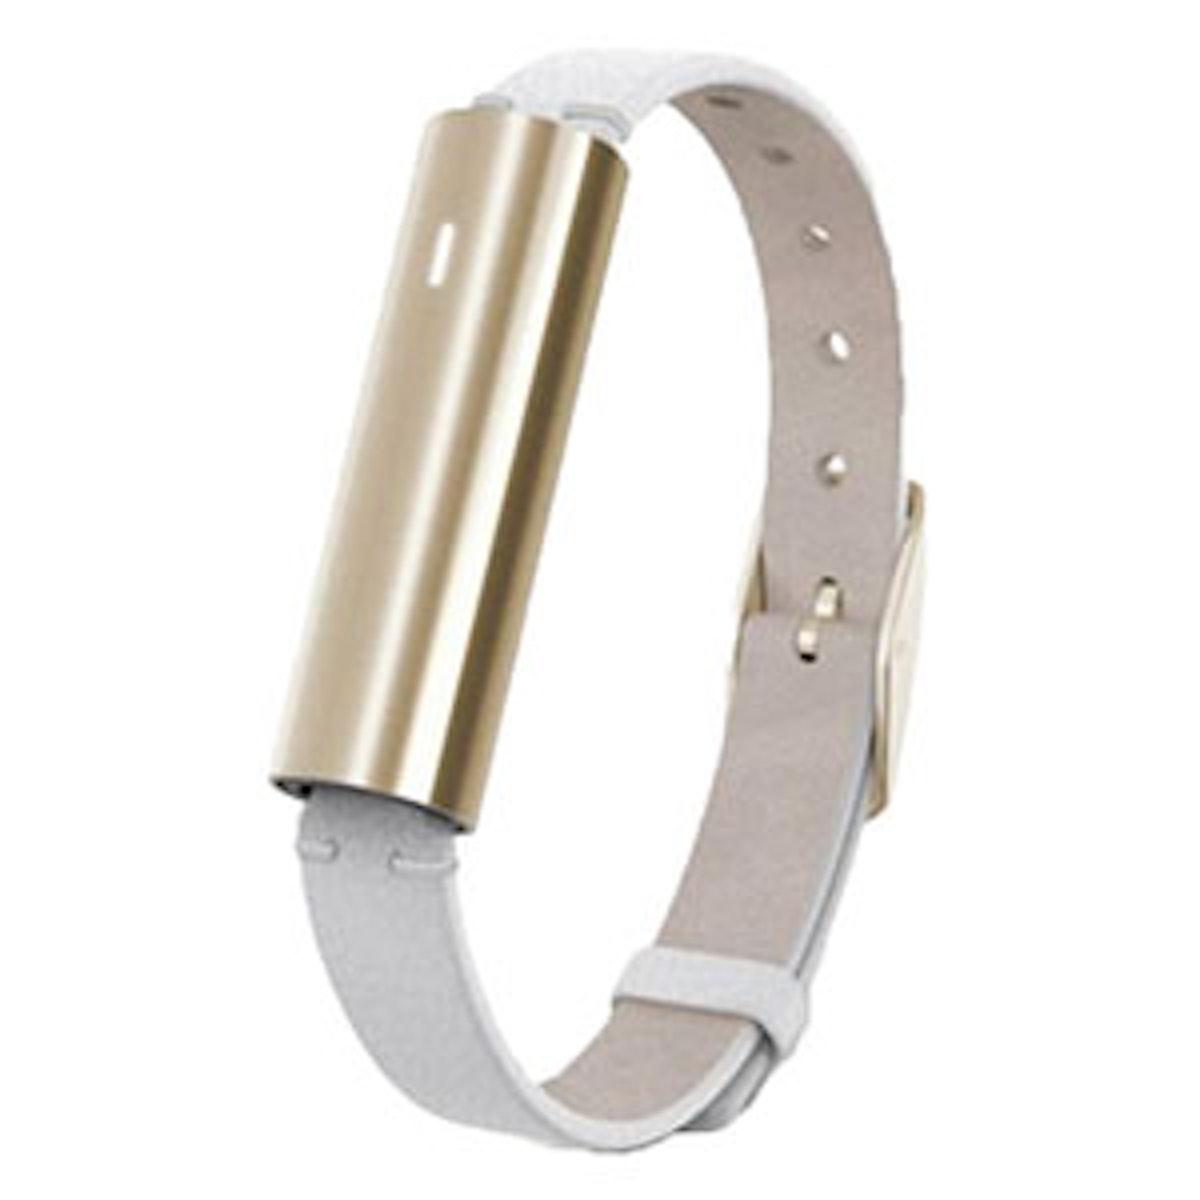 Ray Goldtone Stainless Steel Fitness & Sleep Tracker